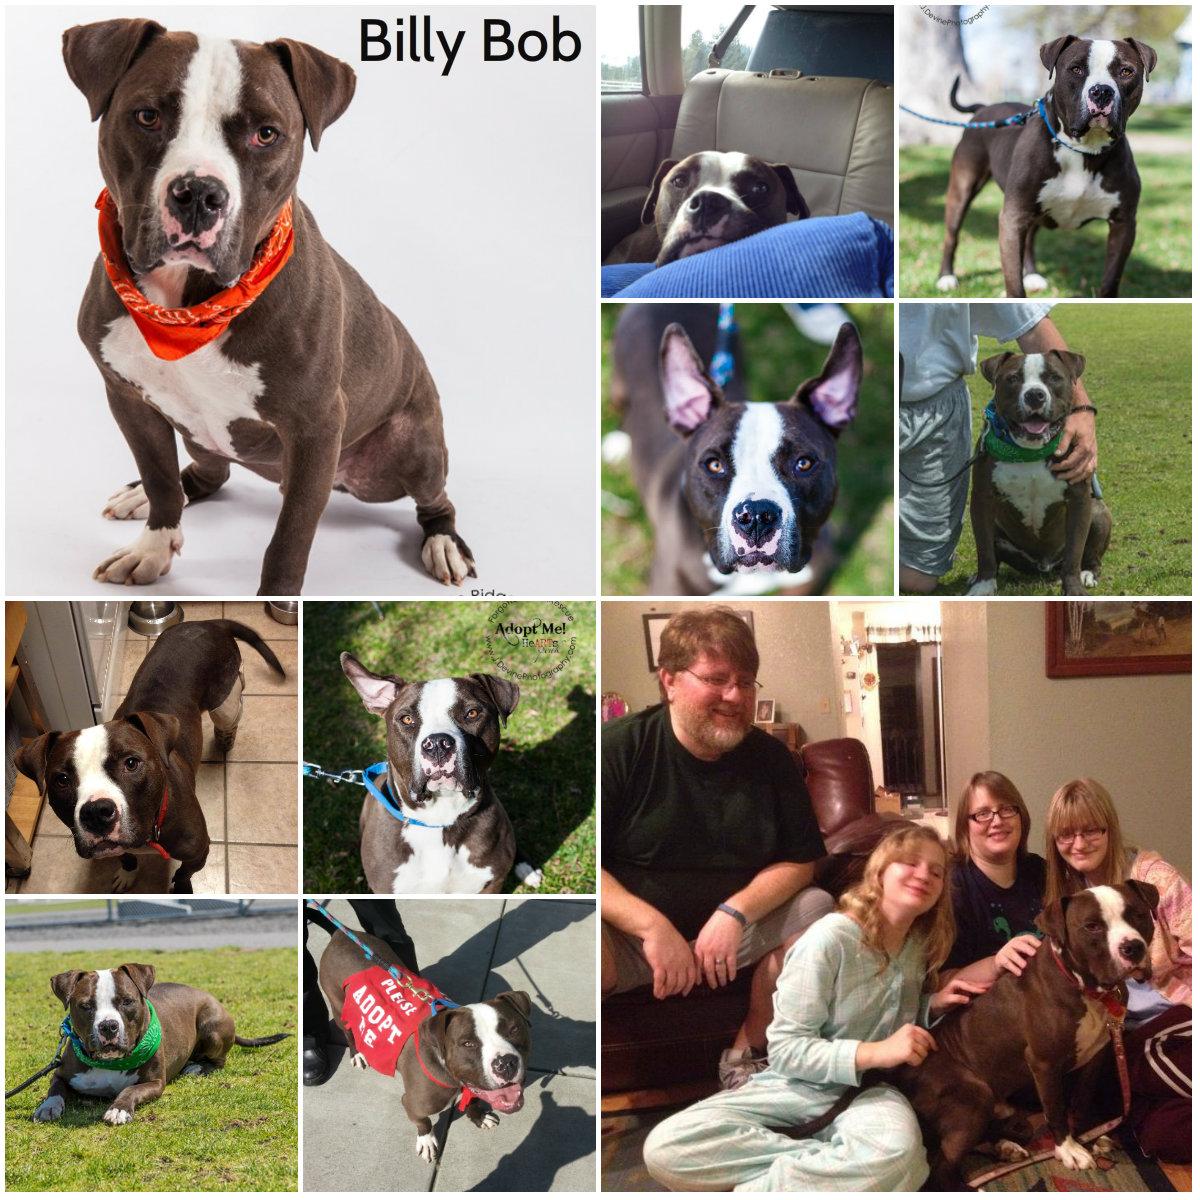 Billy Bob